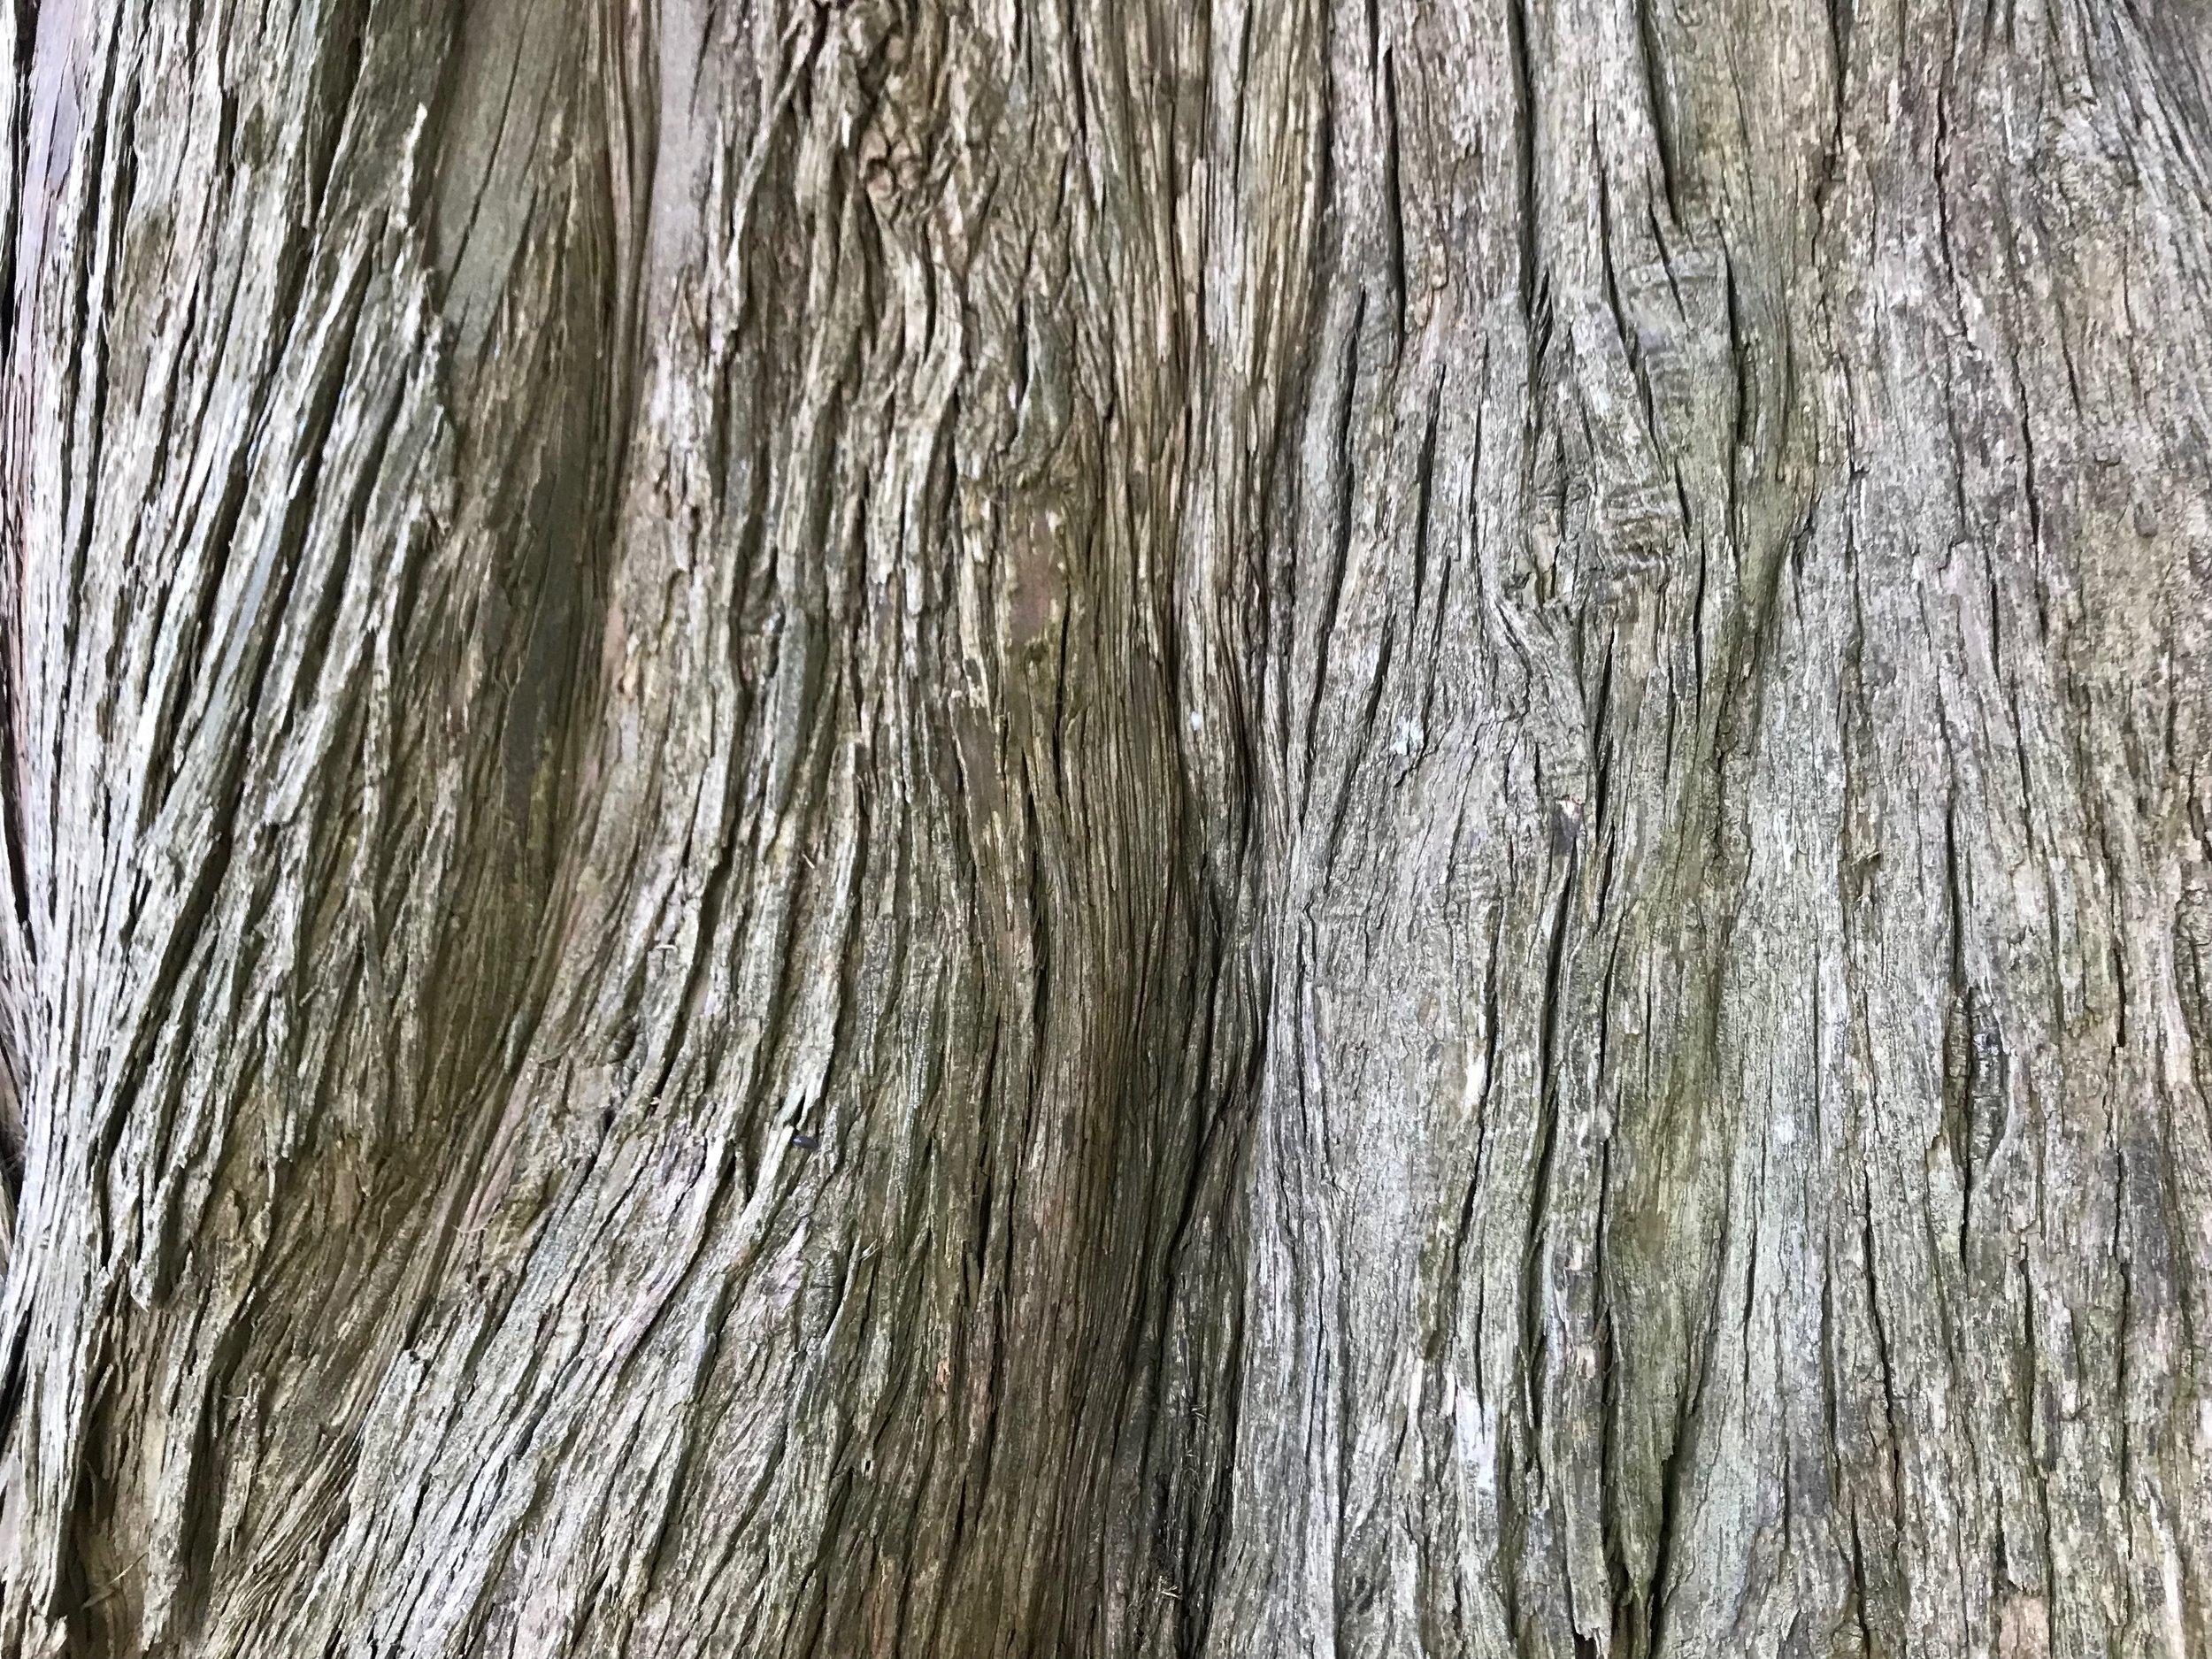 A tree trunk that caught my eye on my last walk through Golden Gate Park.